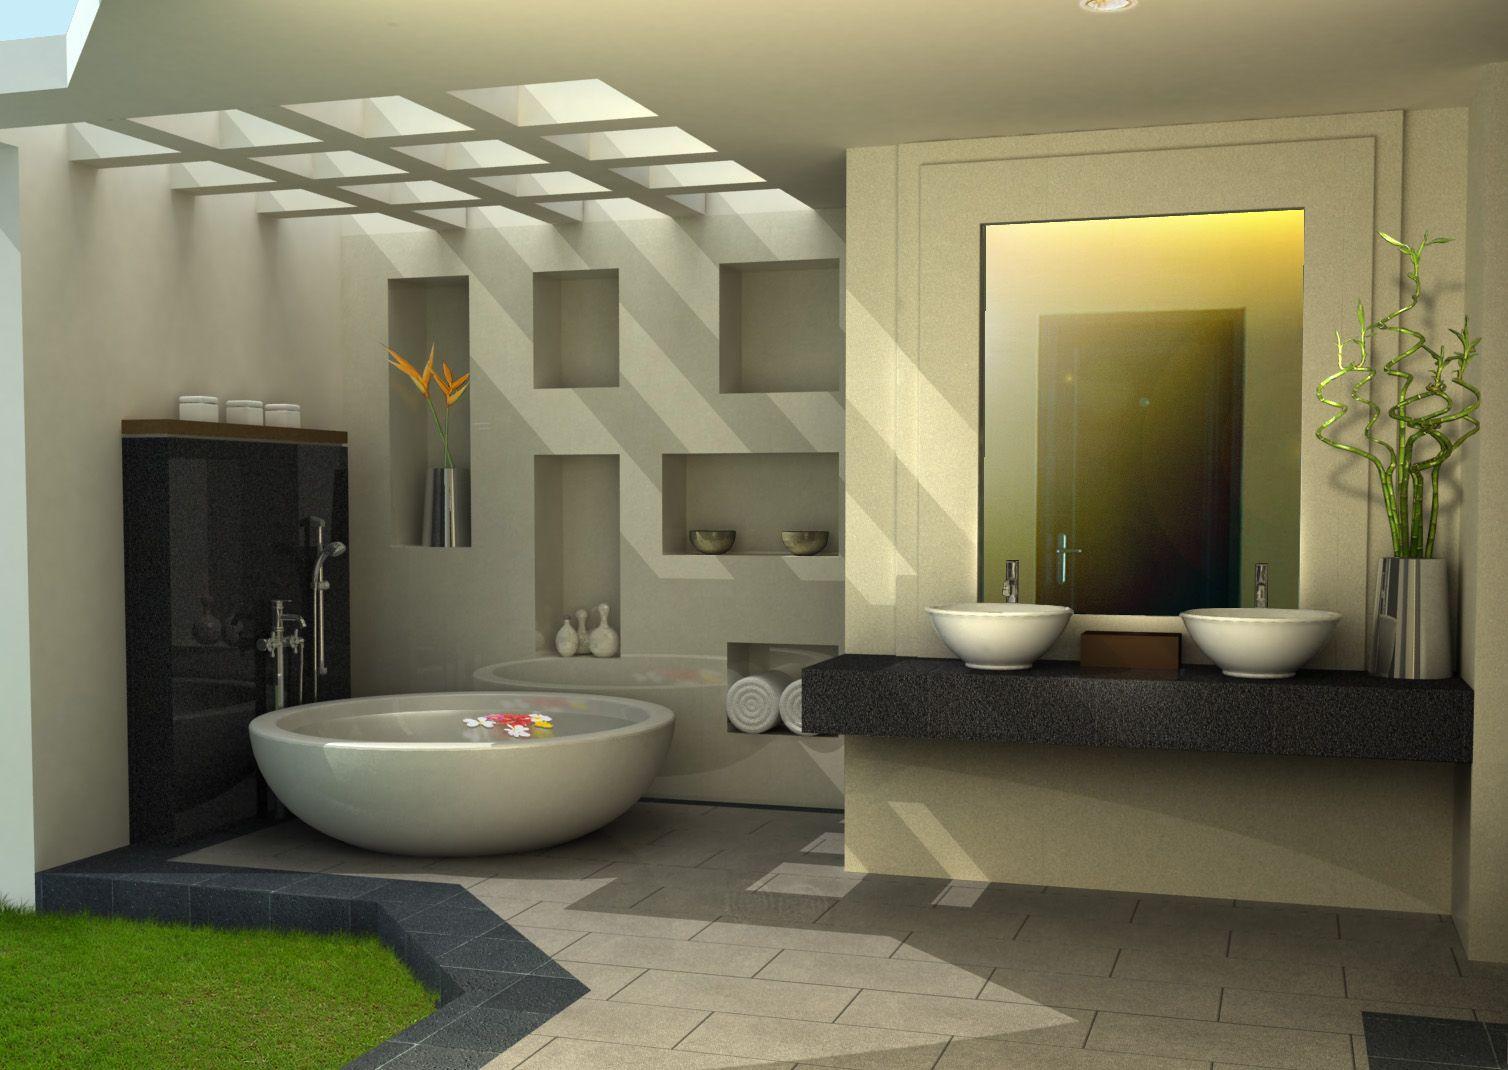 Proyek Bangunan Terpercaya Bathroom Mirror Bathroom Lighting Lighted Bathroom Mirror